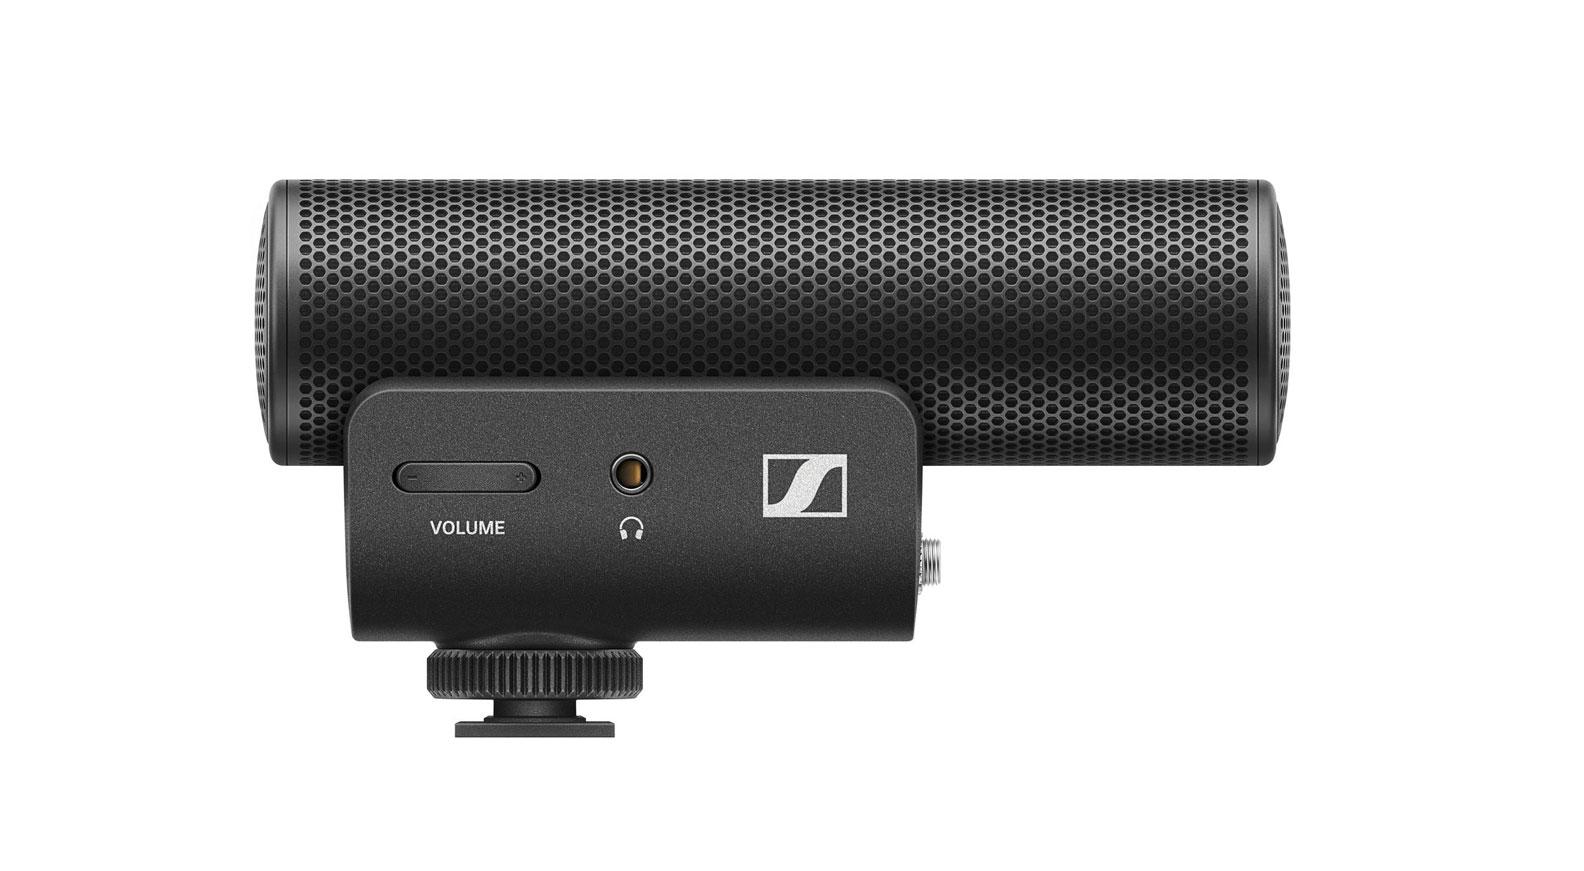 New shotgun microphone for smartphones and DSLMs - Sennheiser MKE 400